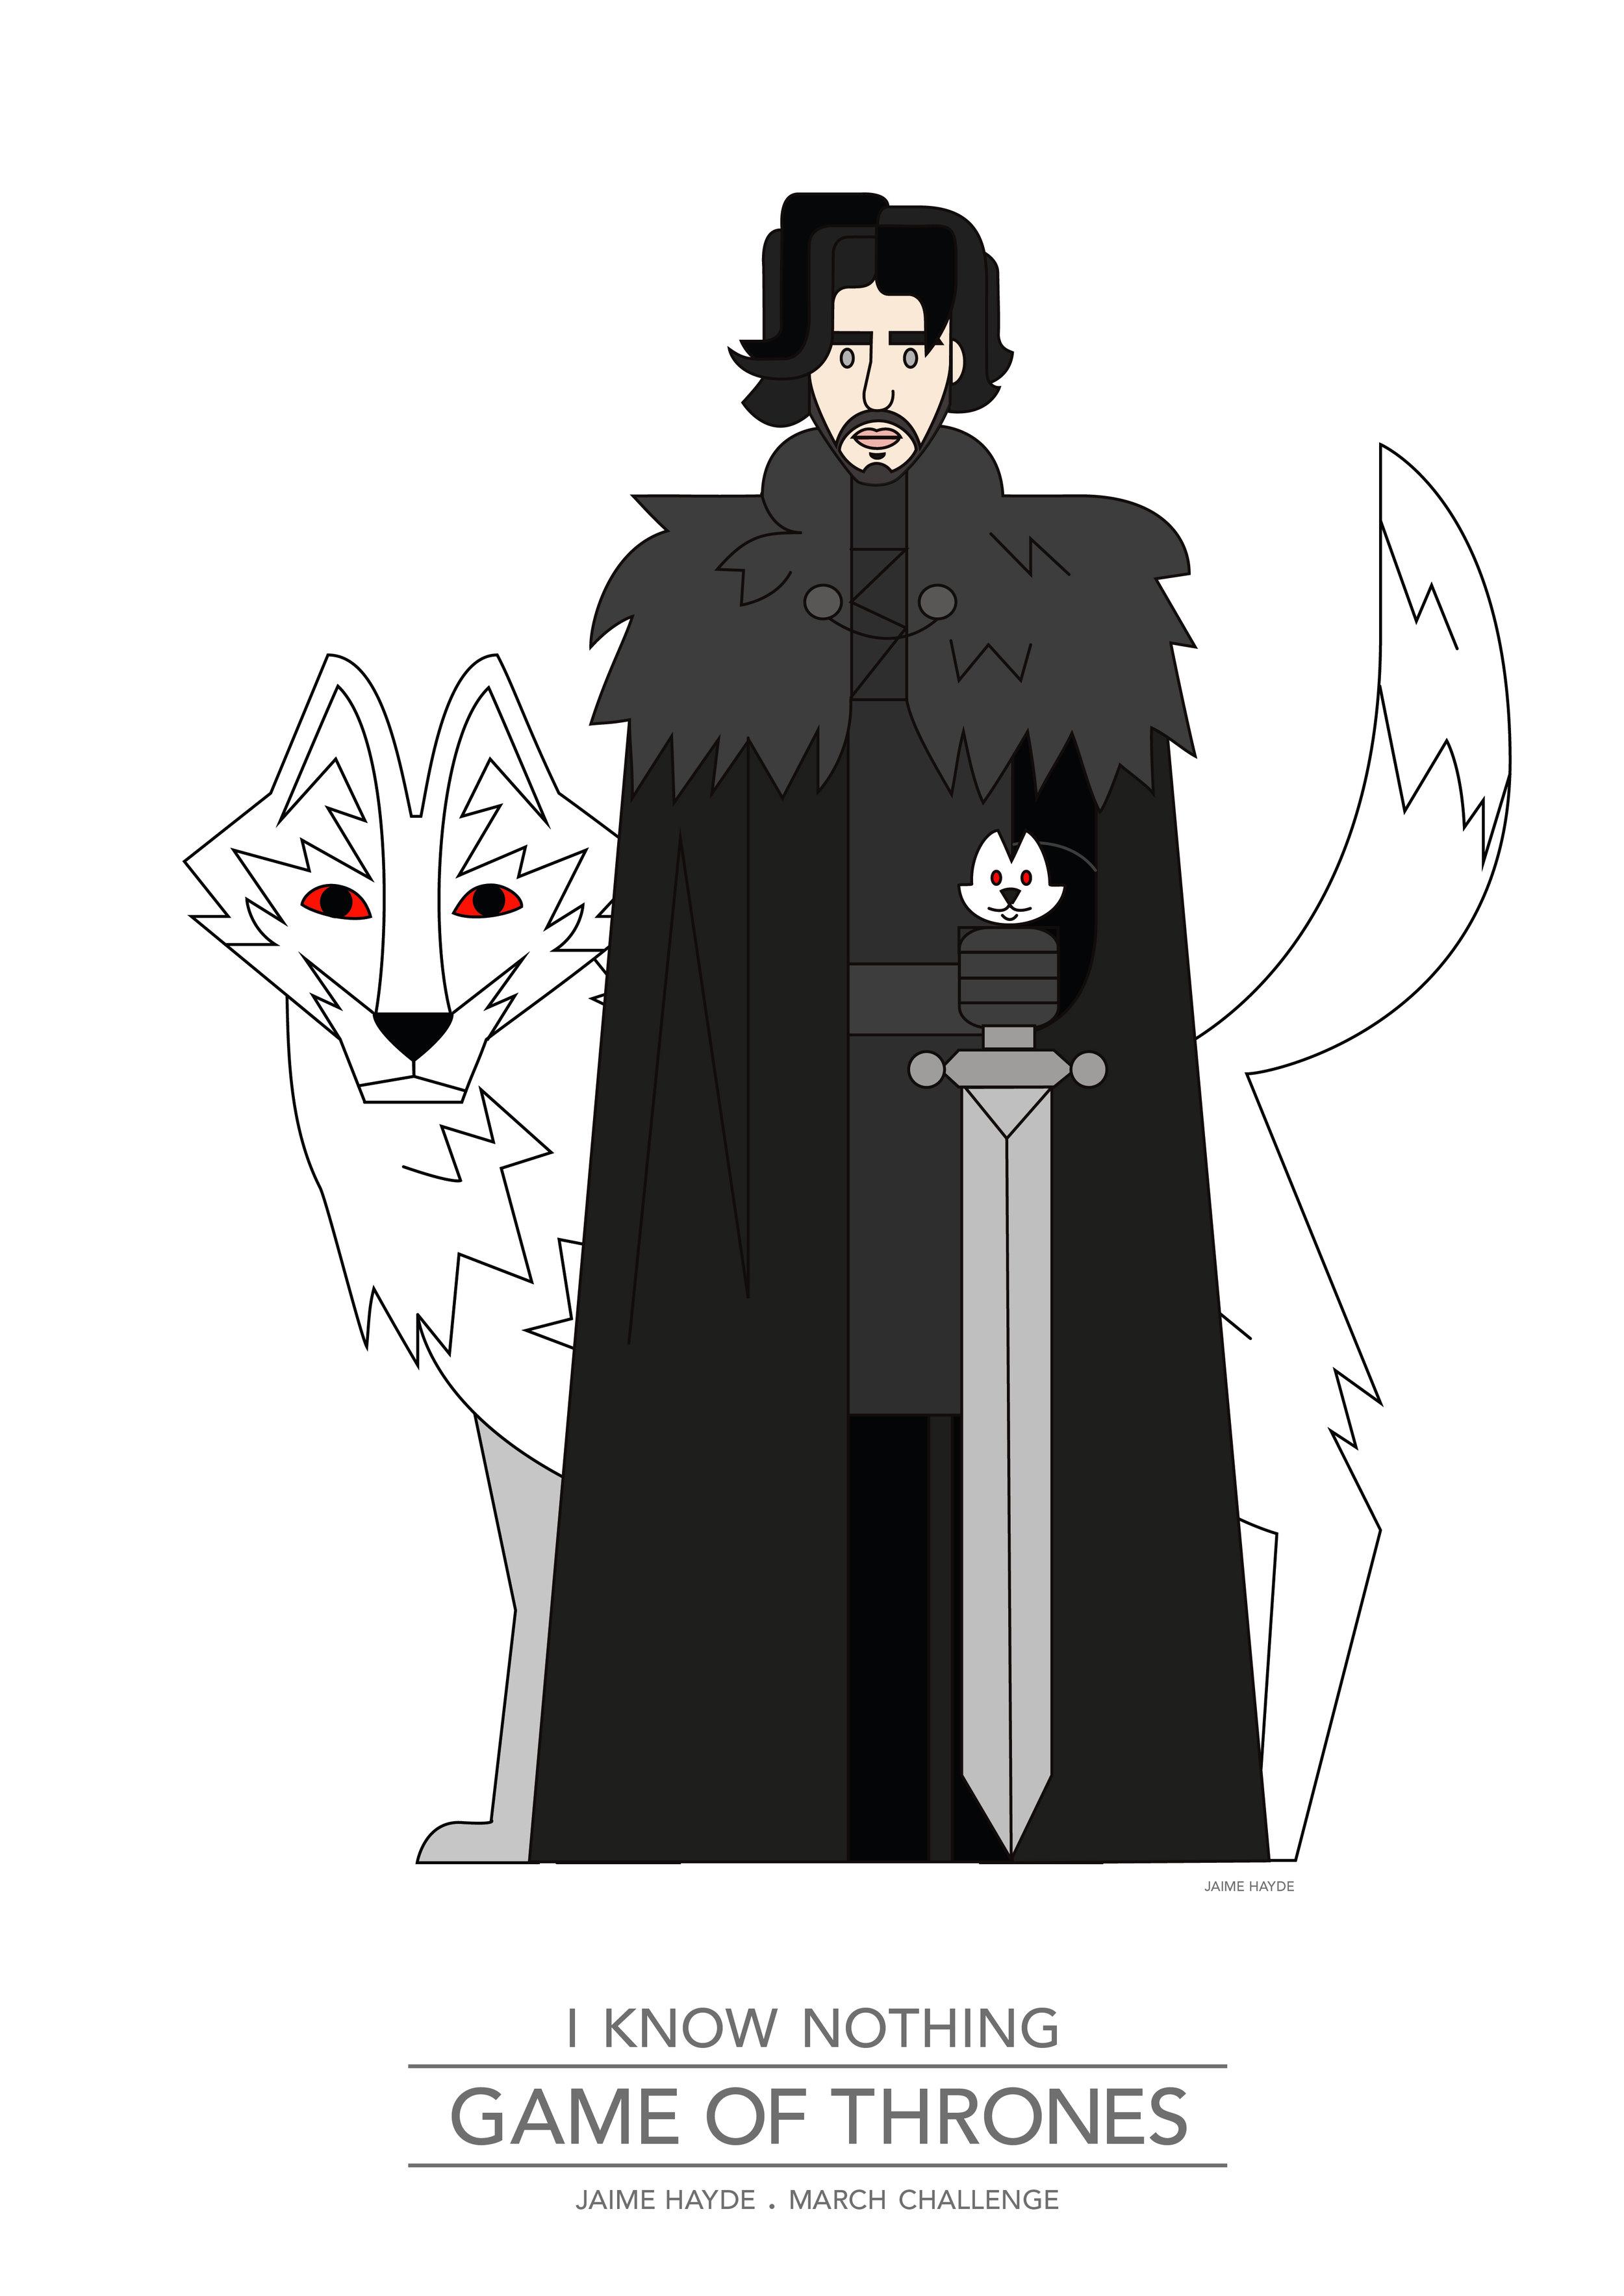 Game-of-thrones-Juego-de-tronos-Jon Snow-illustration-poster.jpg